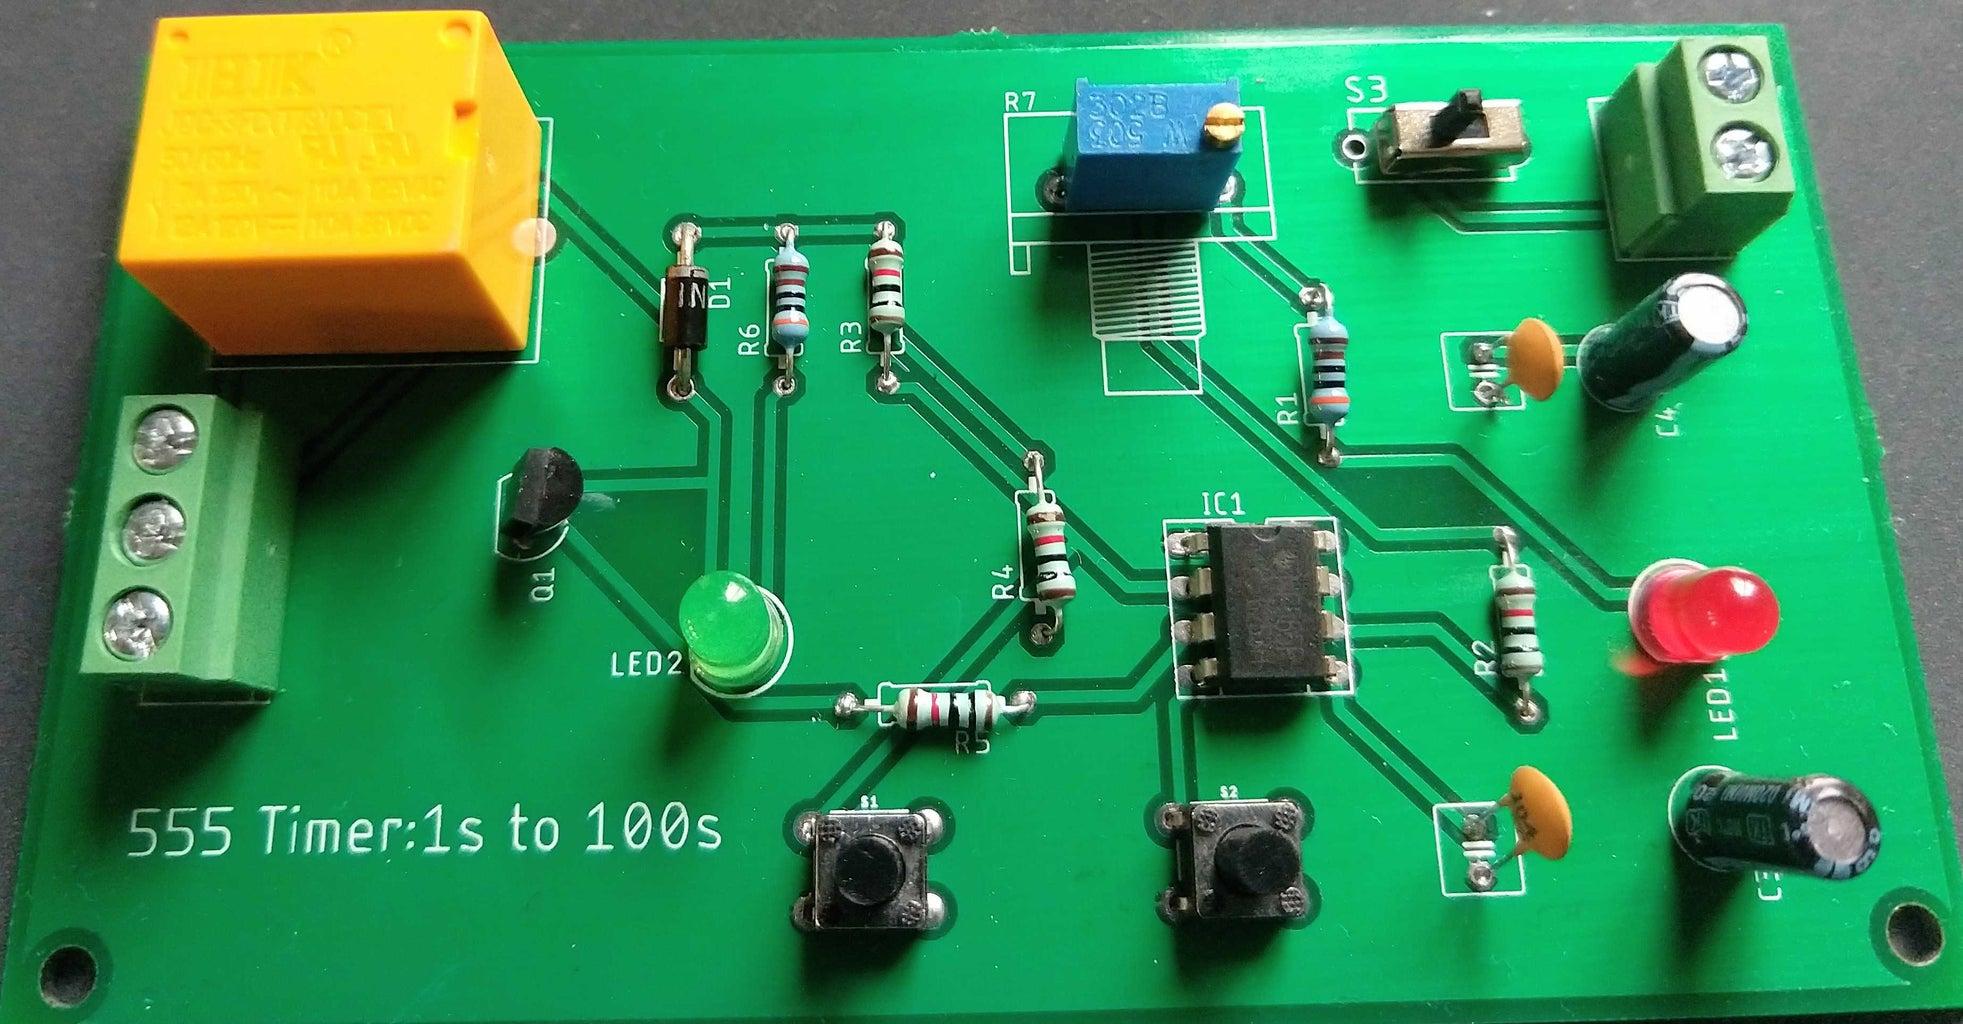 Components Assembled Board